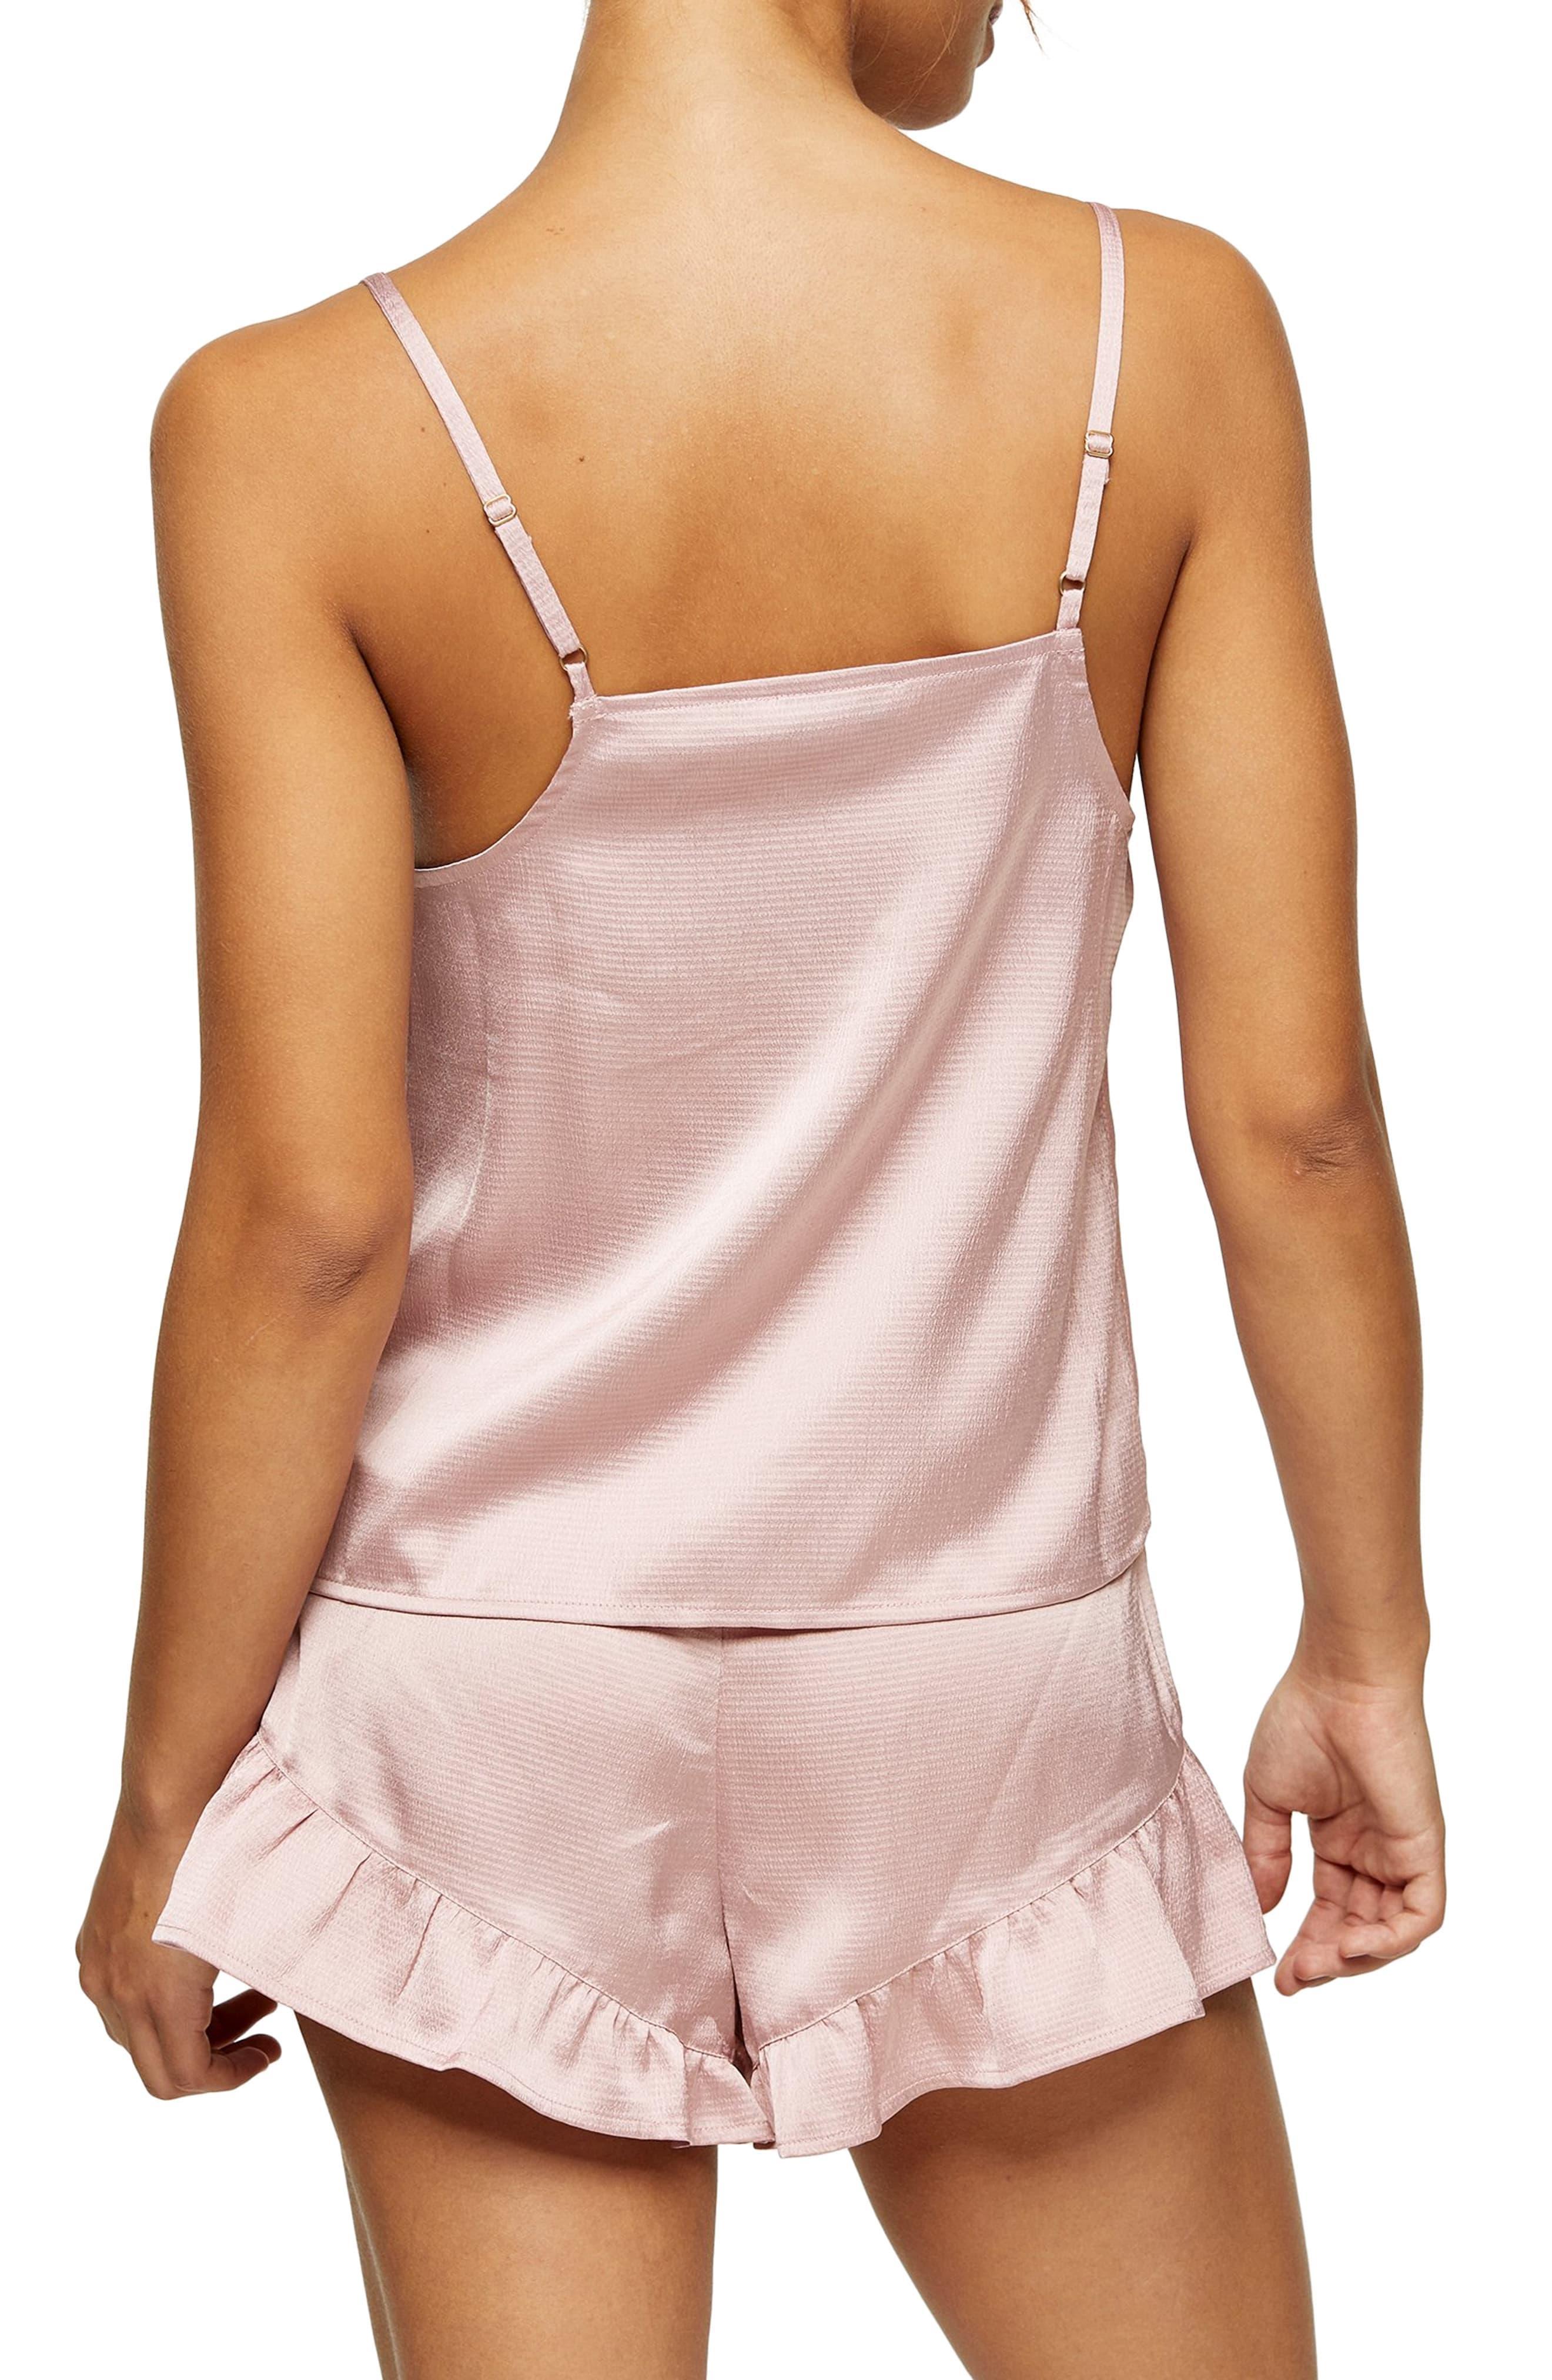 Willow S Mens Summer Casual Loose Printing Home Sleepwear Pajama Silk Satin Shorts Pants Hiking Bodybuilding